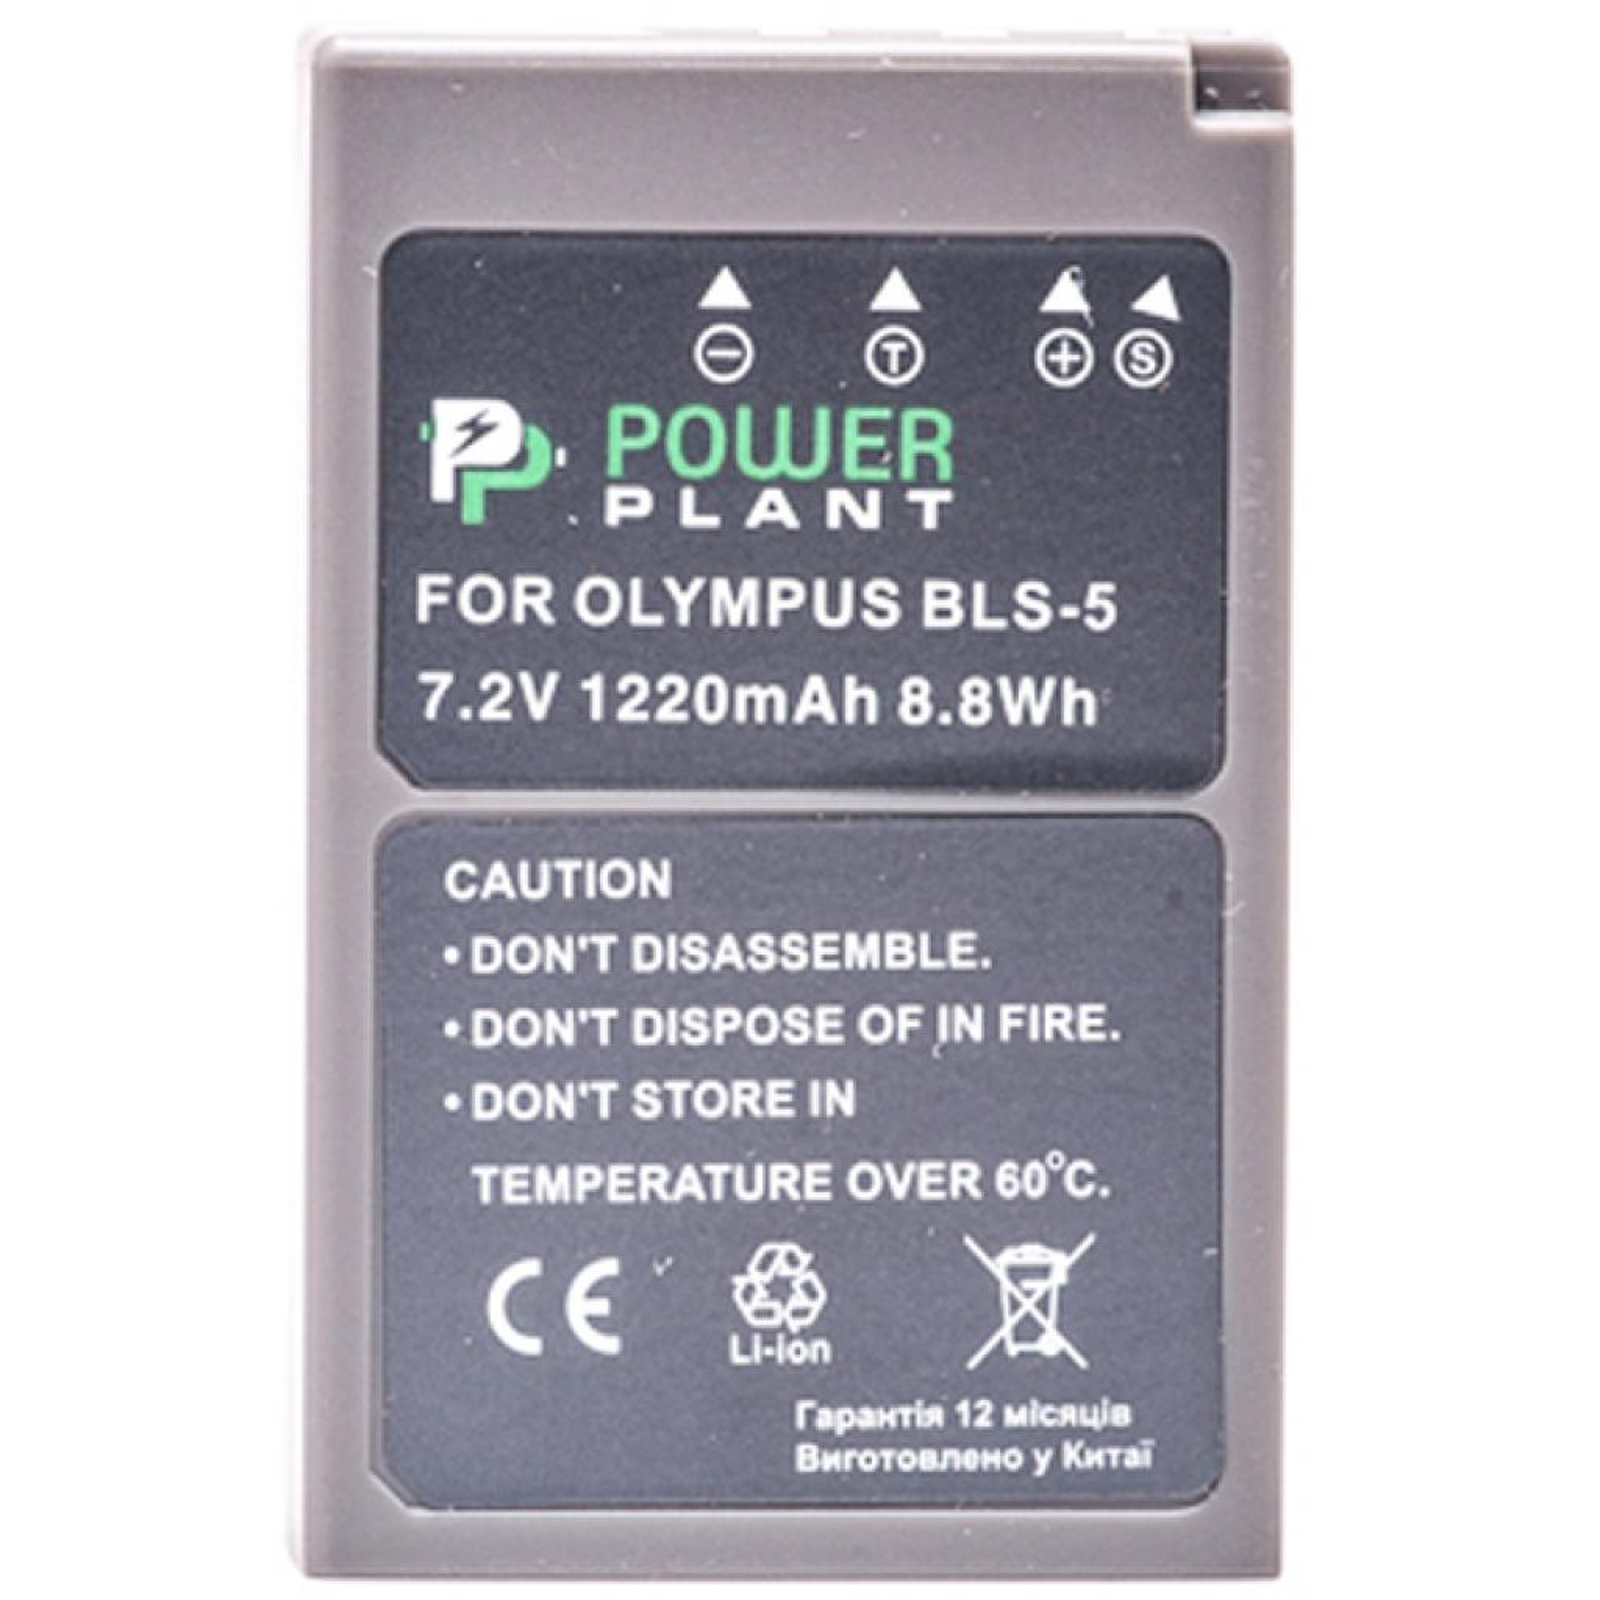 Аккумулятор к фото/видео PowerPlant Olympus PS-BLS5 (DV00DV1287) изображение 2